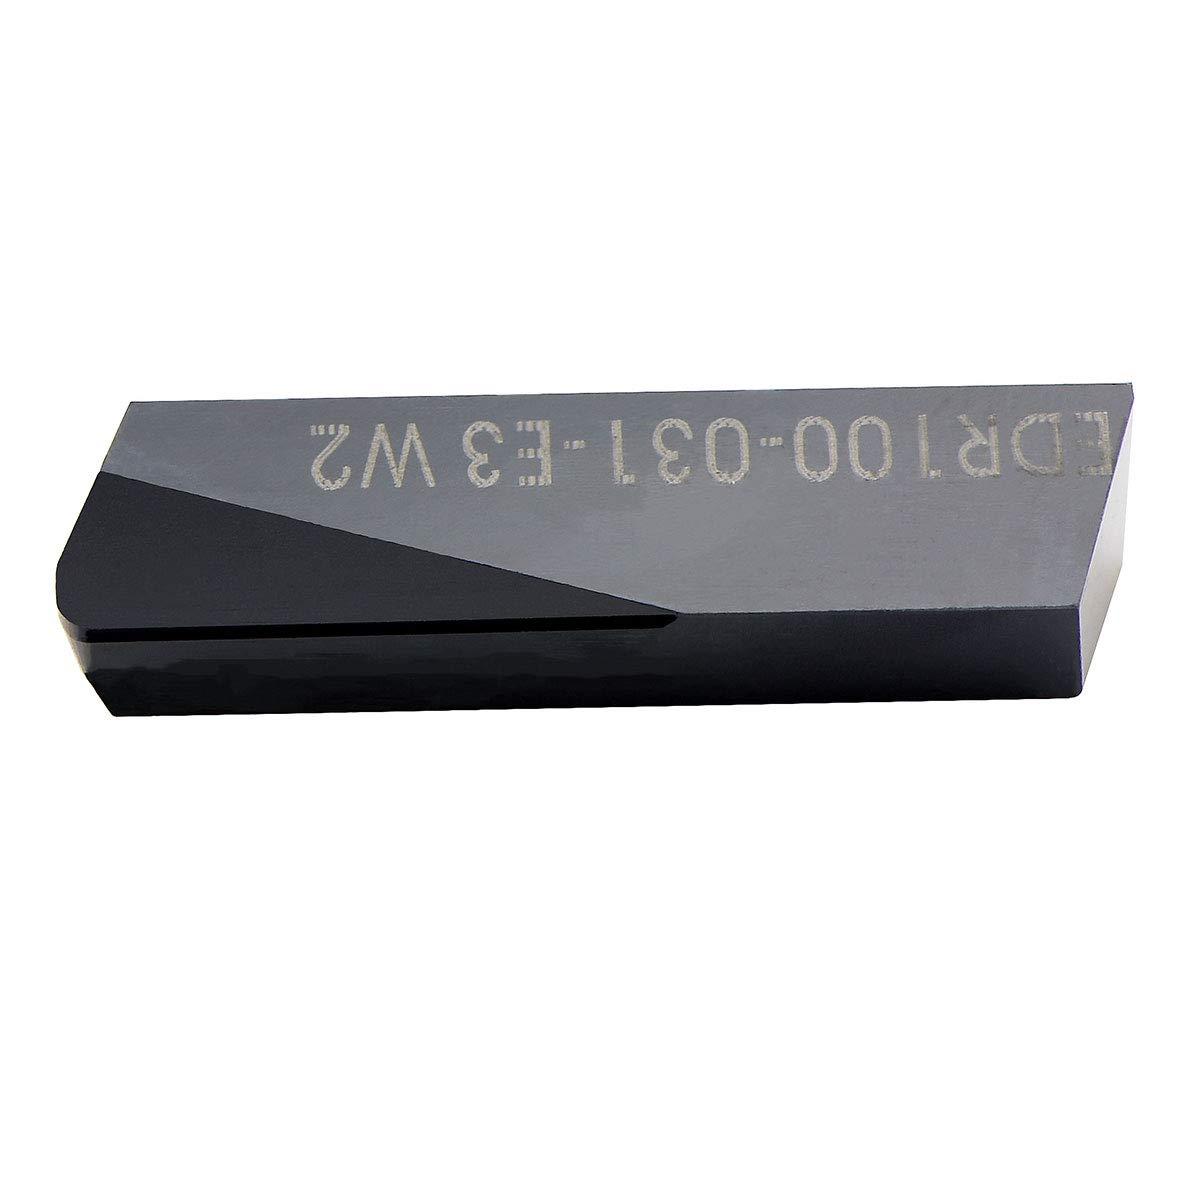 MAXTOOL 10PCs EDR100-062-E3-W4P10 ENDMILL PCD Tip Milling Inserts Polycrystalline Diamond Grade 1500